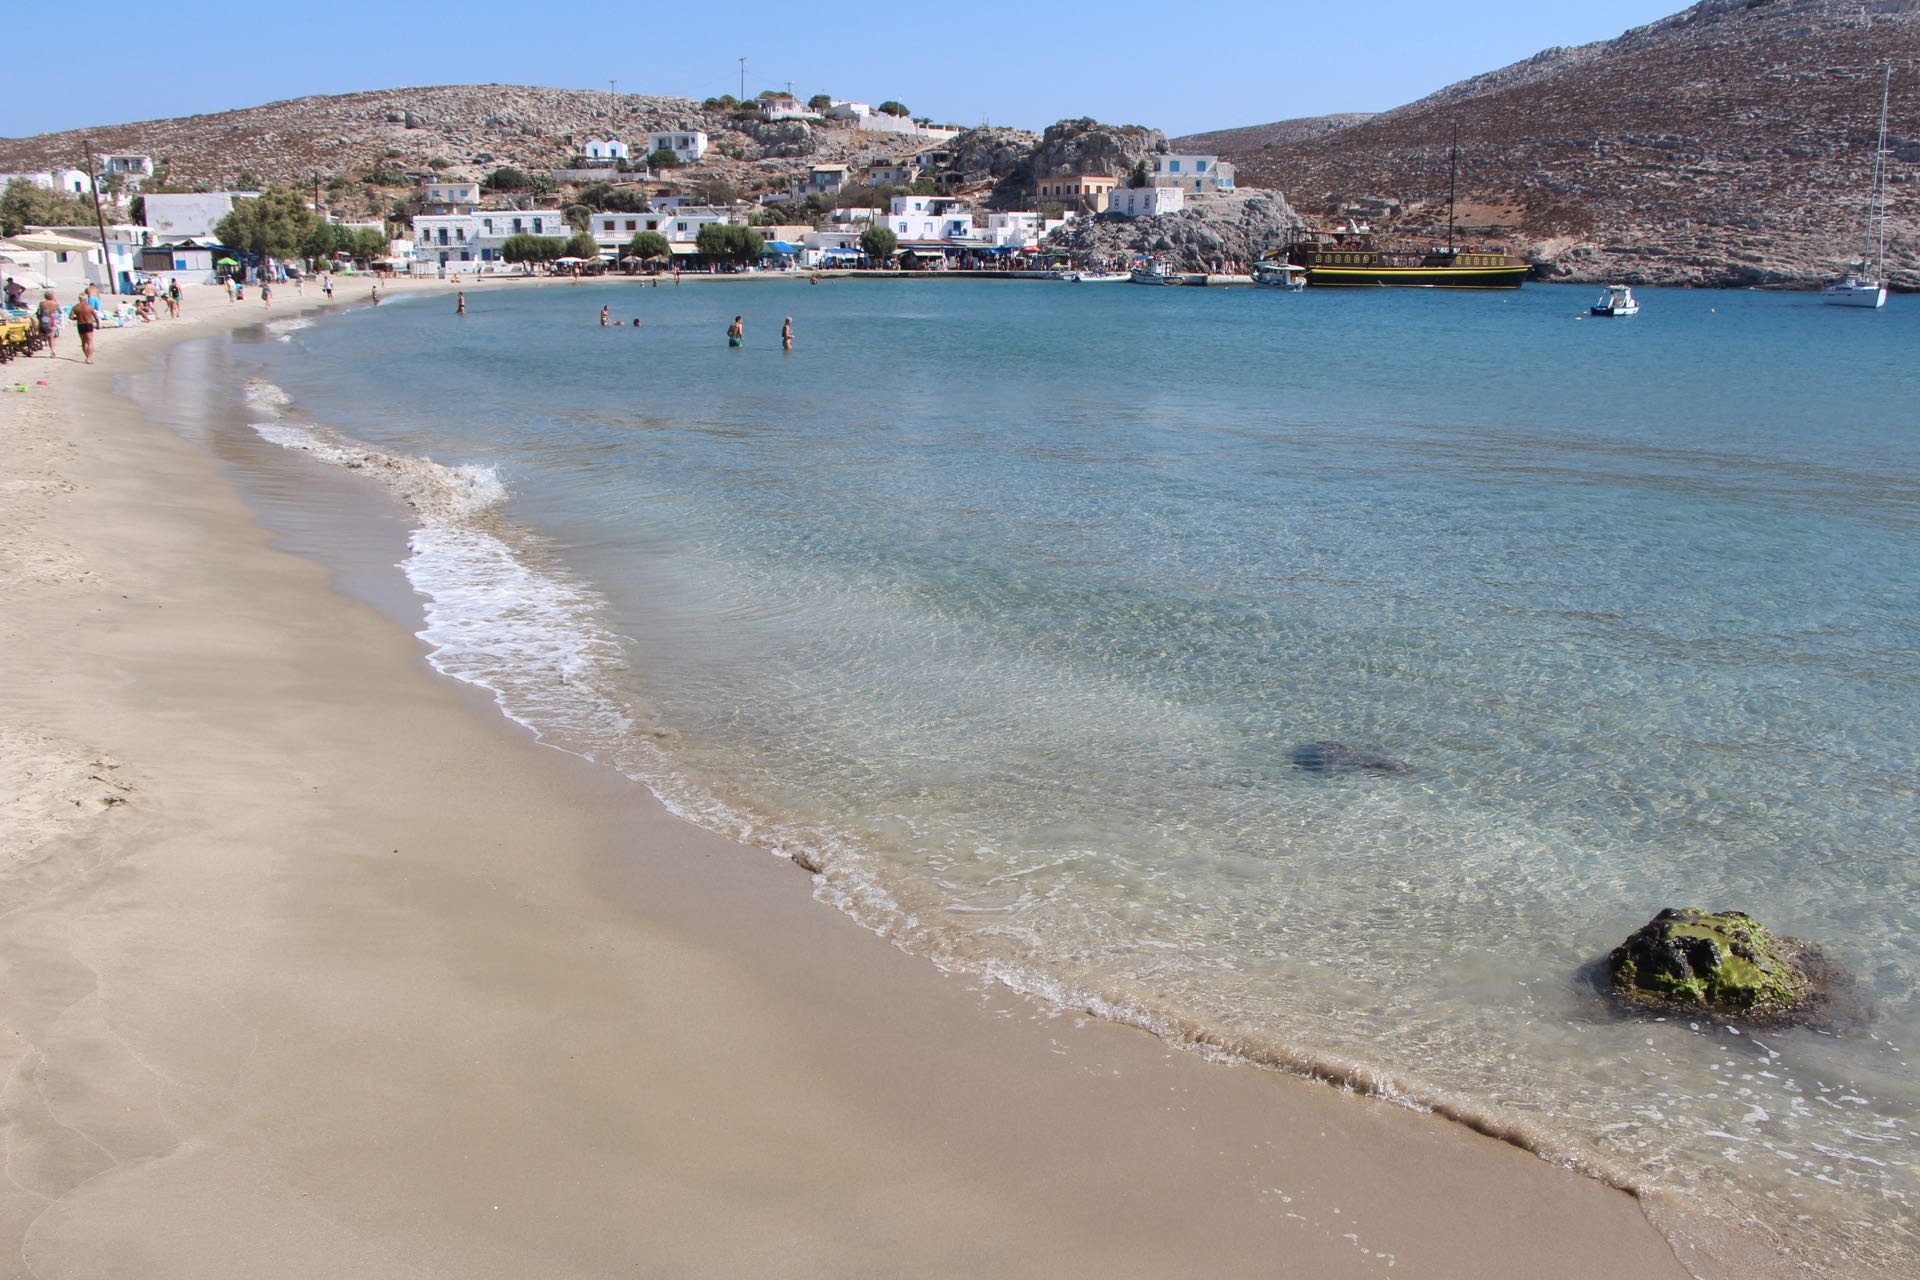 The Avlaki Beach in Pserimos